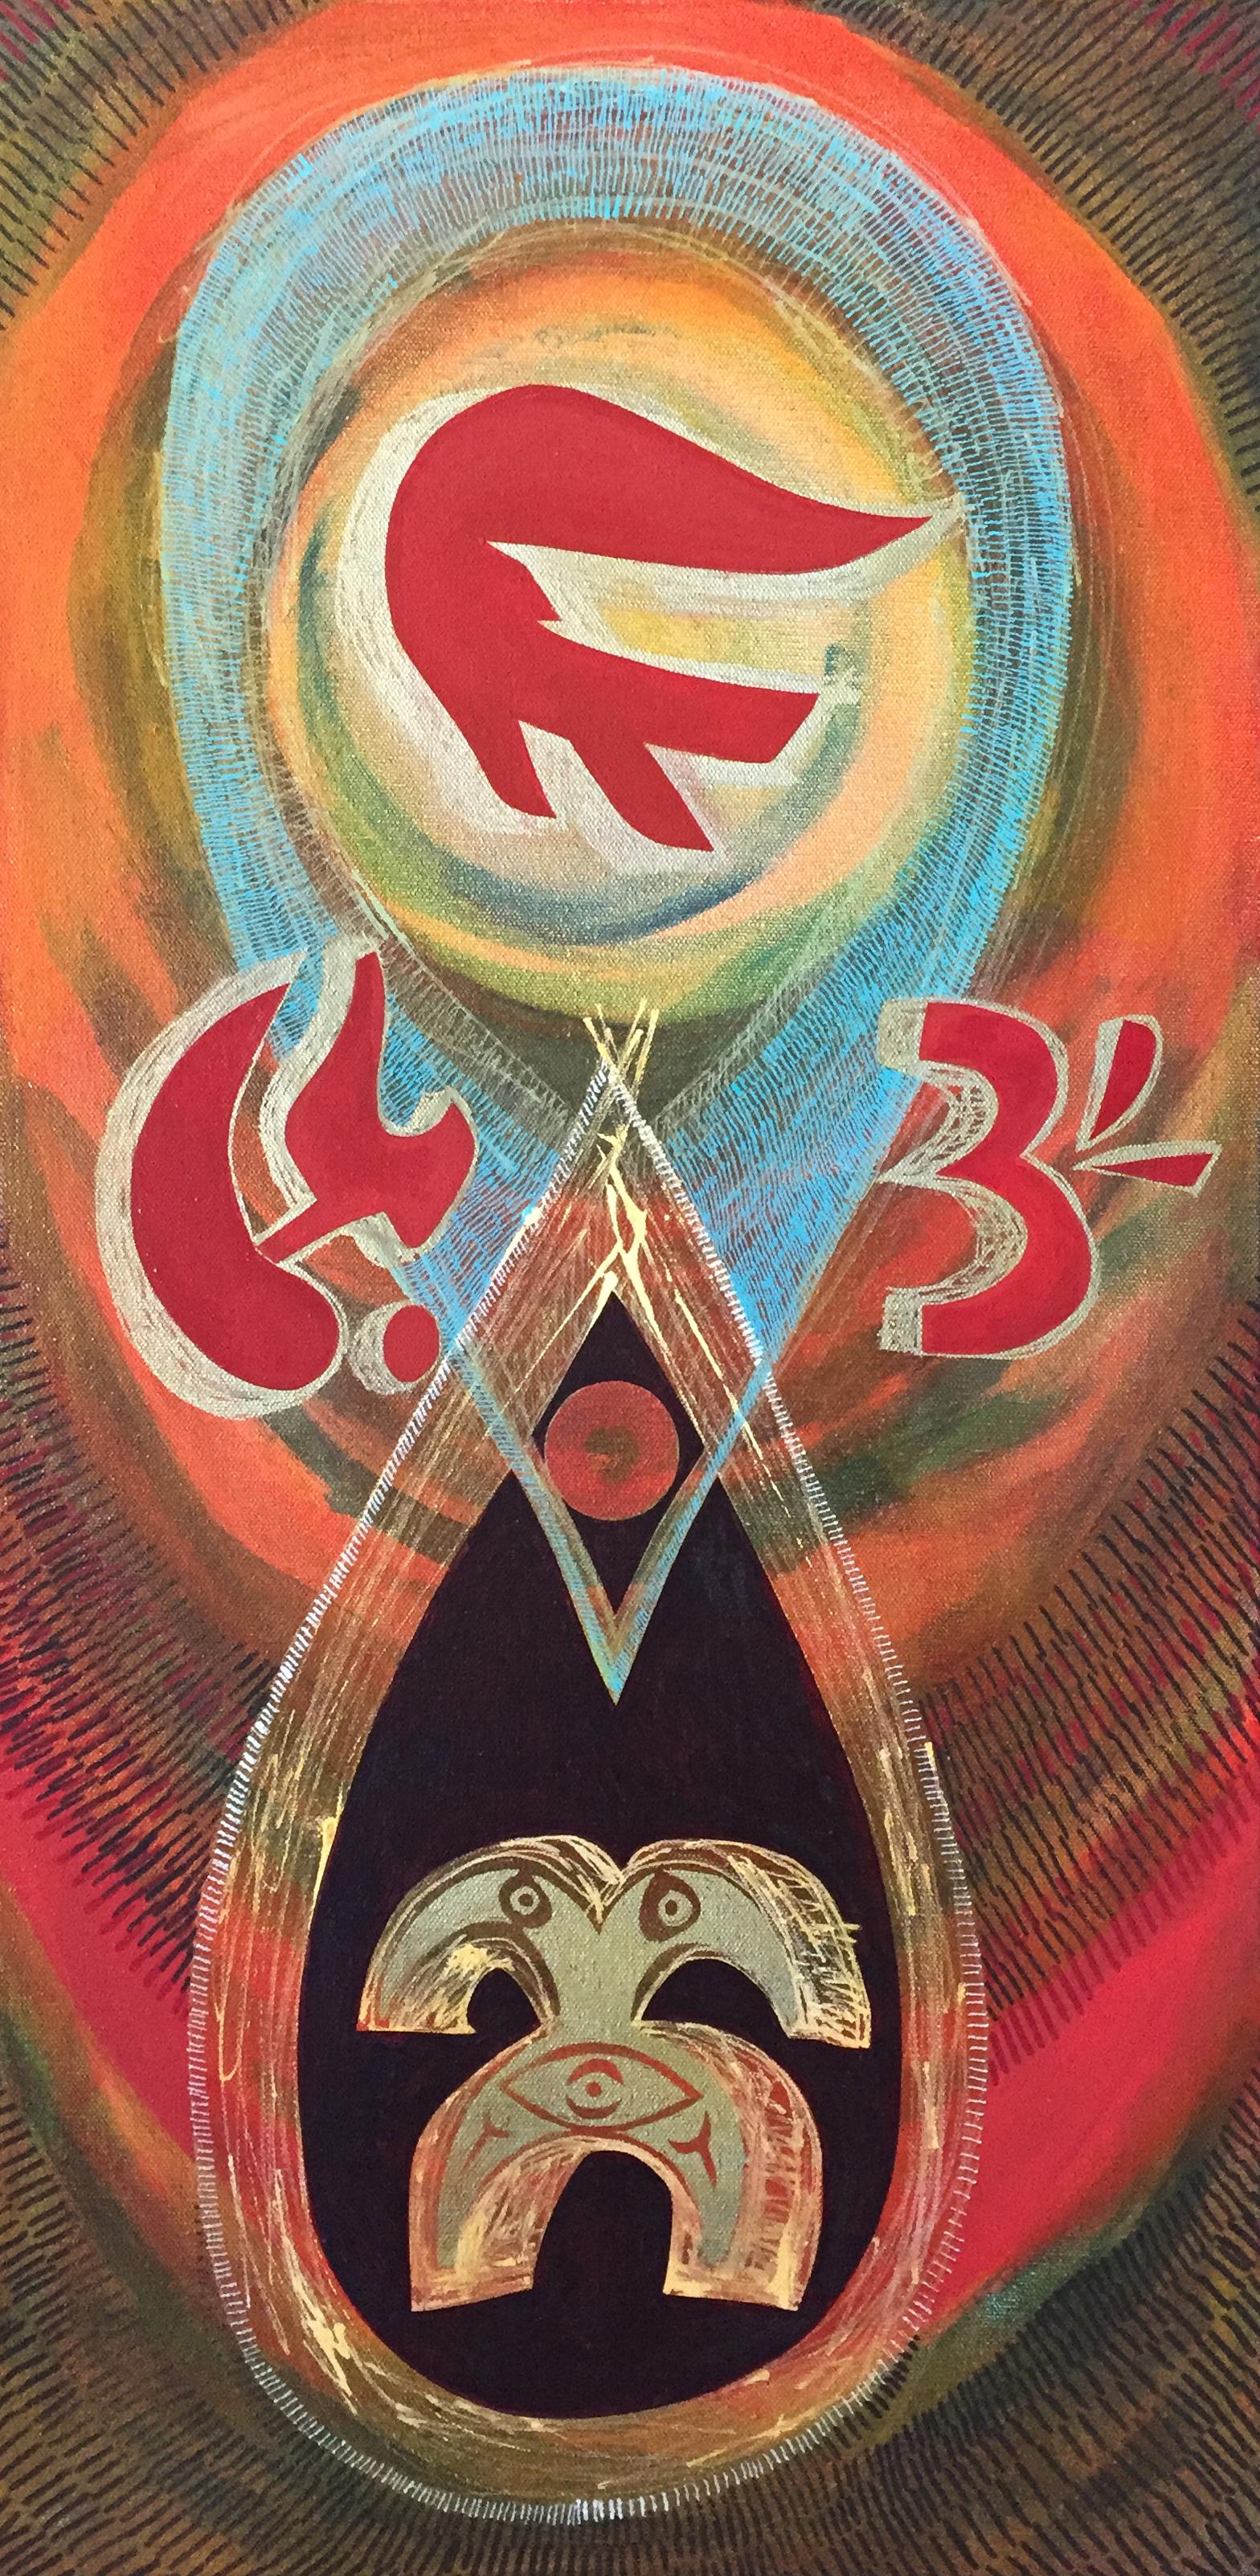 """Thread Through The Needle Into Infinity"" (#1 of 2)"